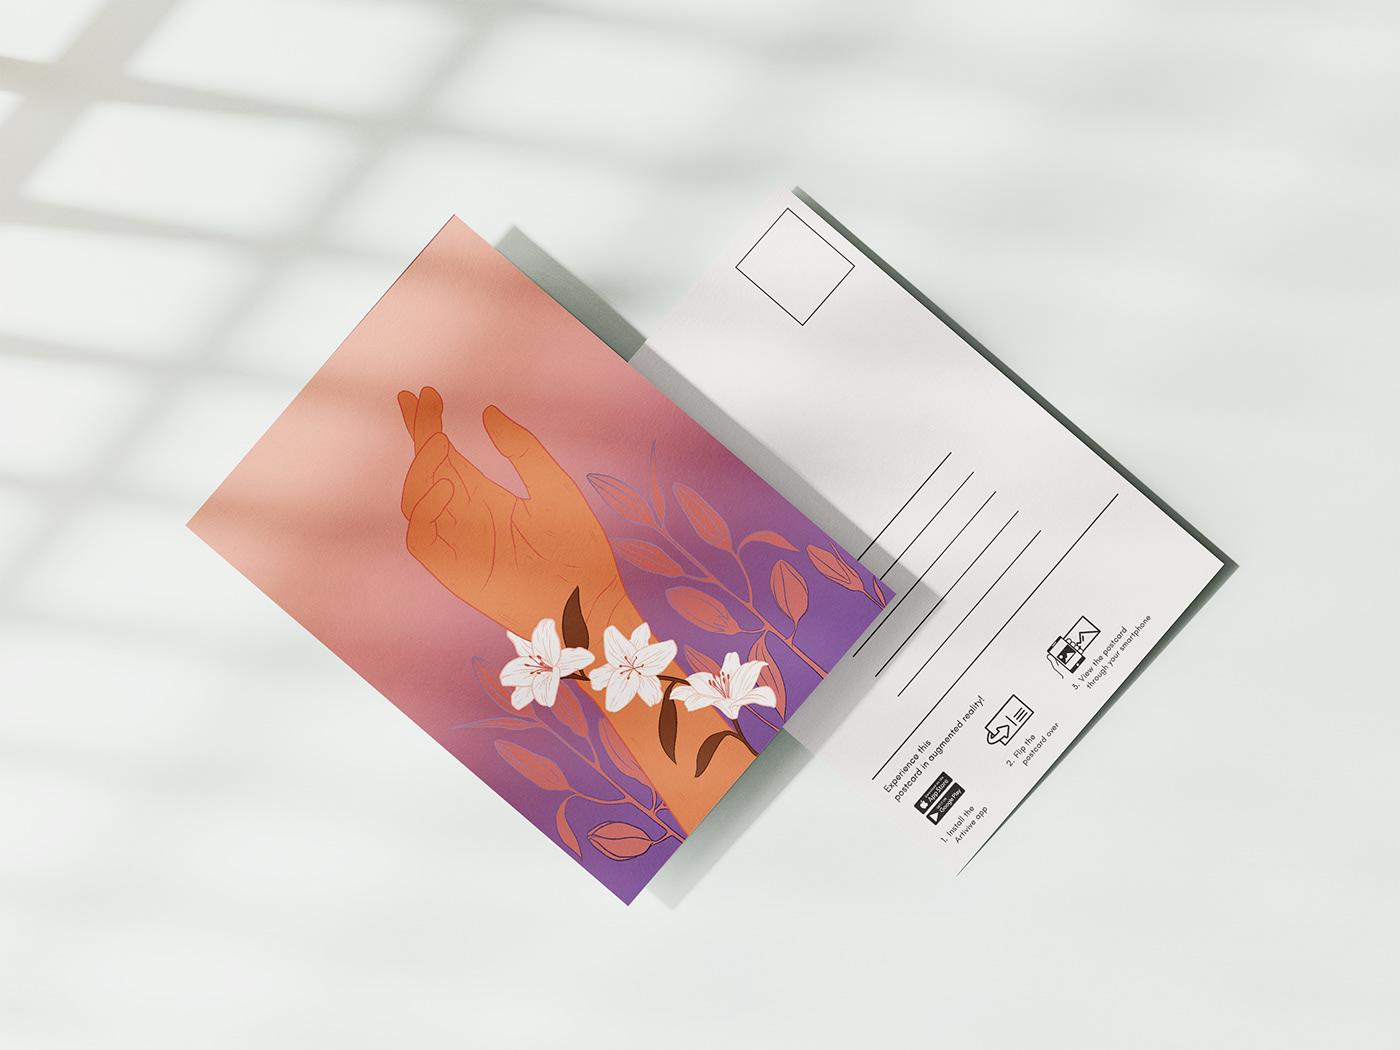 animation  AR artivive connection graduation project ILLUSTRATION  Love Relationships UI/UX Design